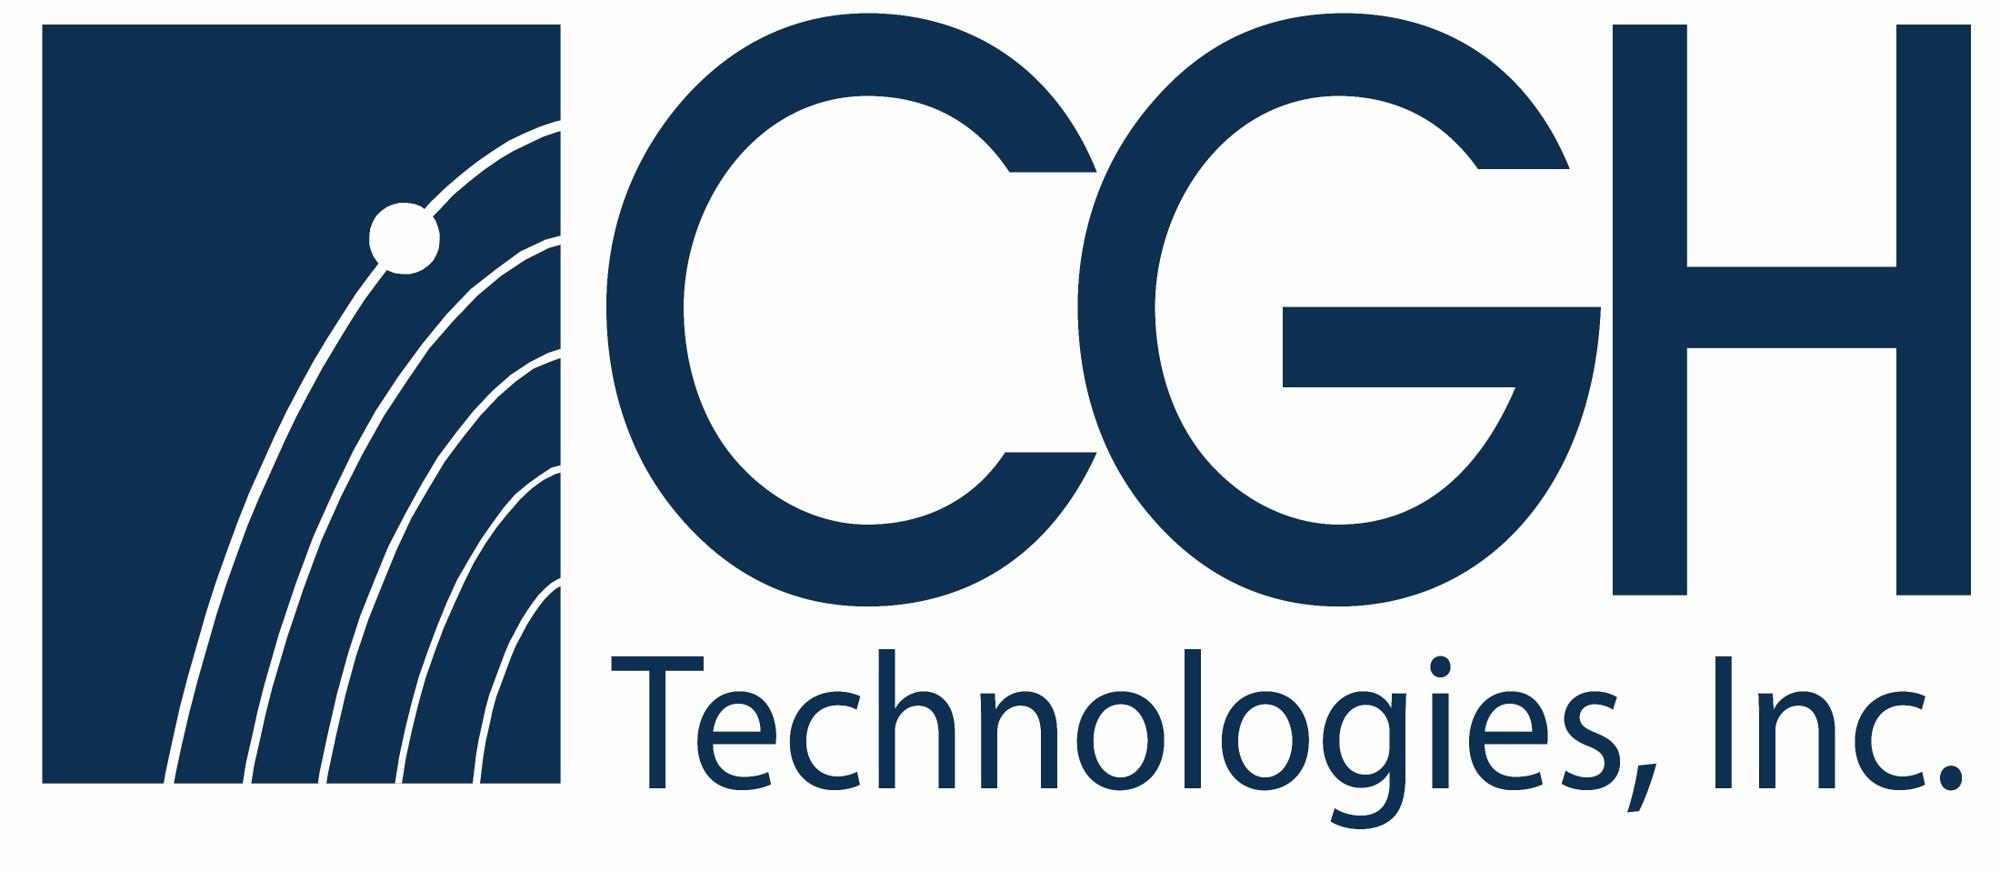 CGH Technologies